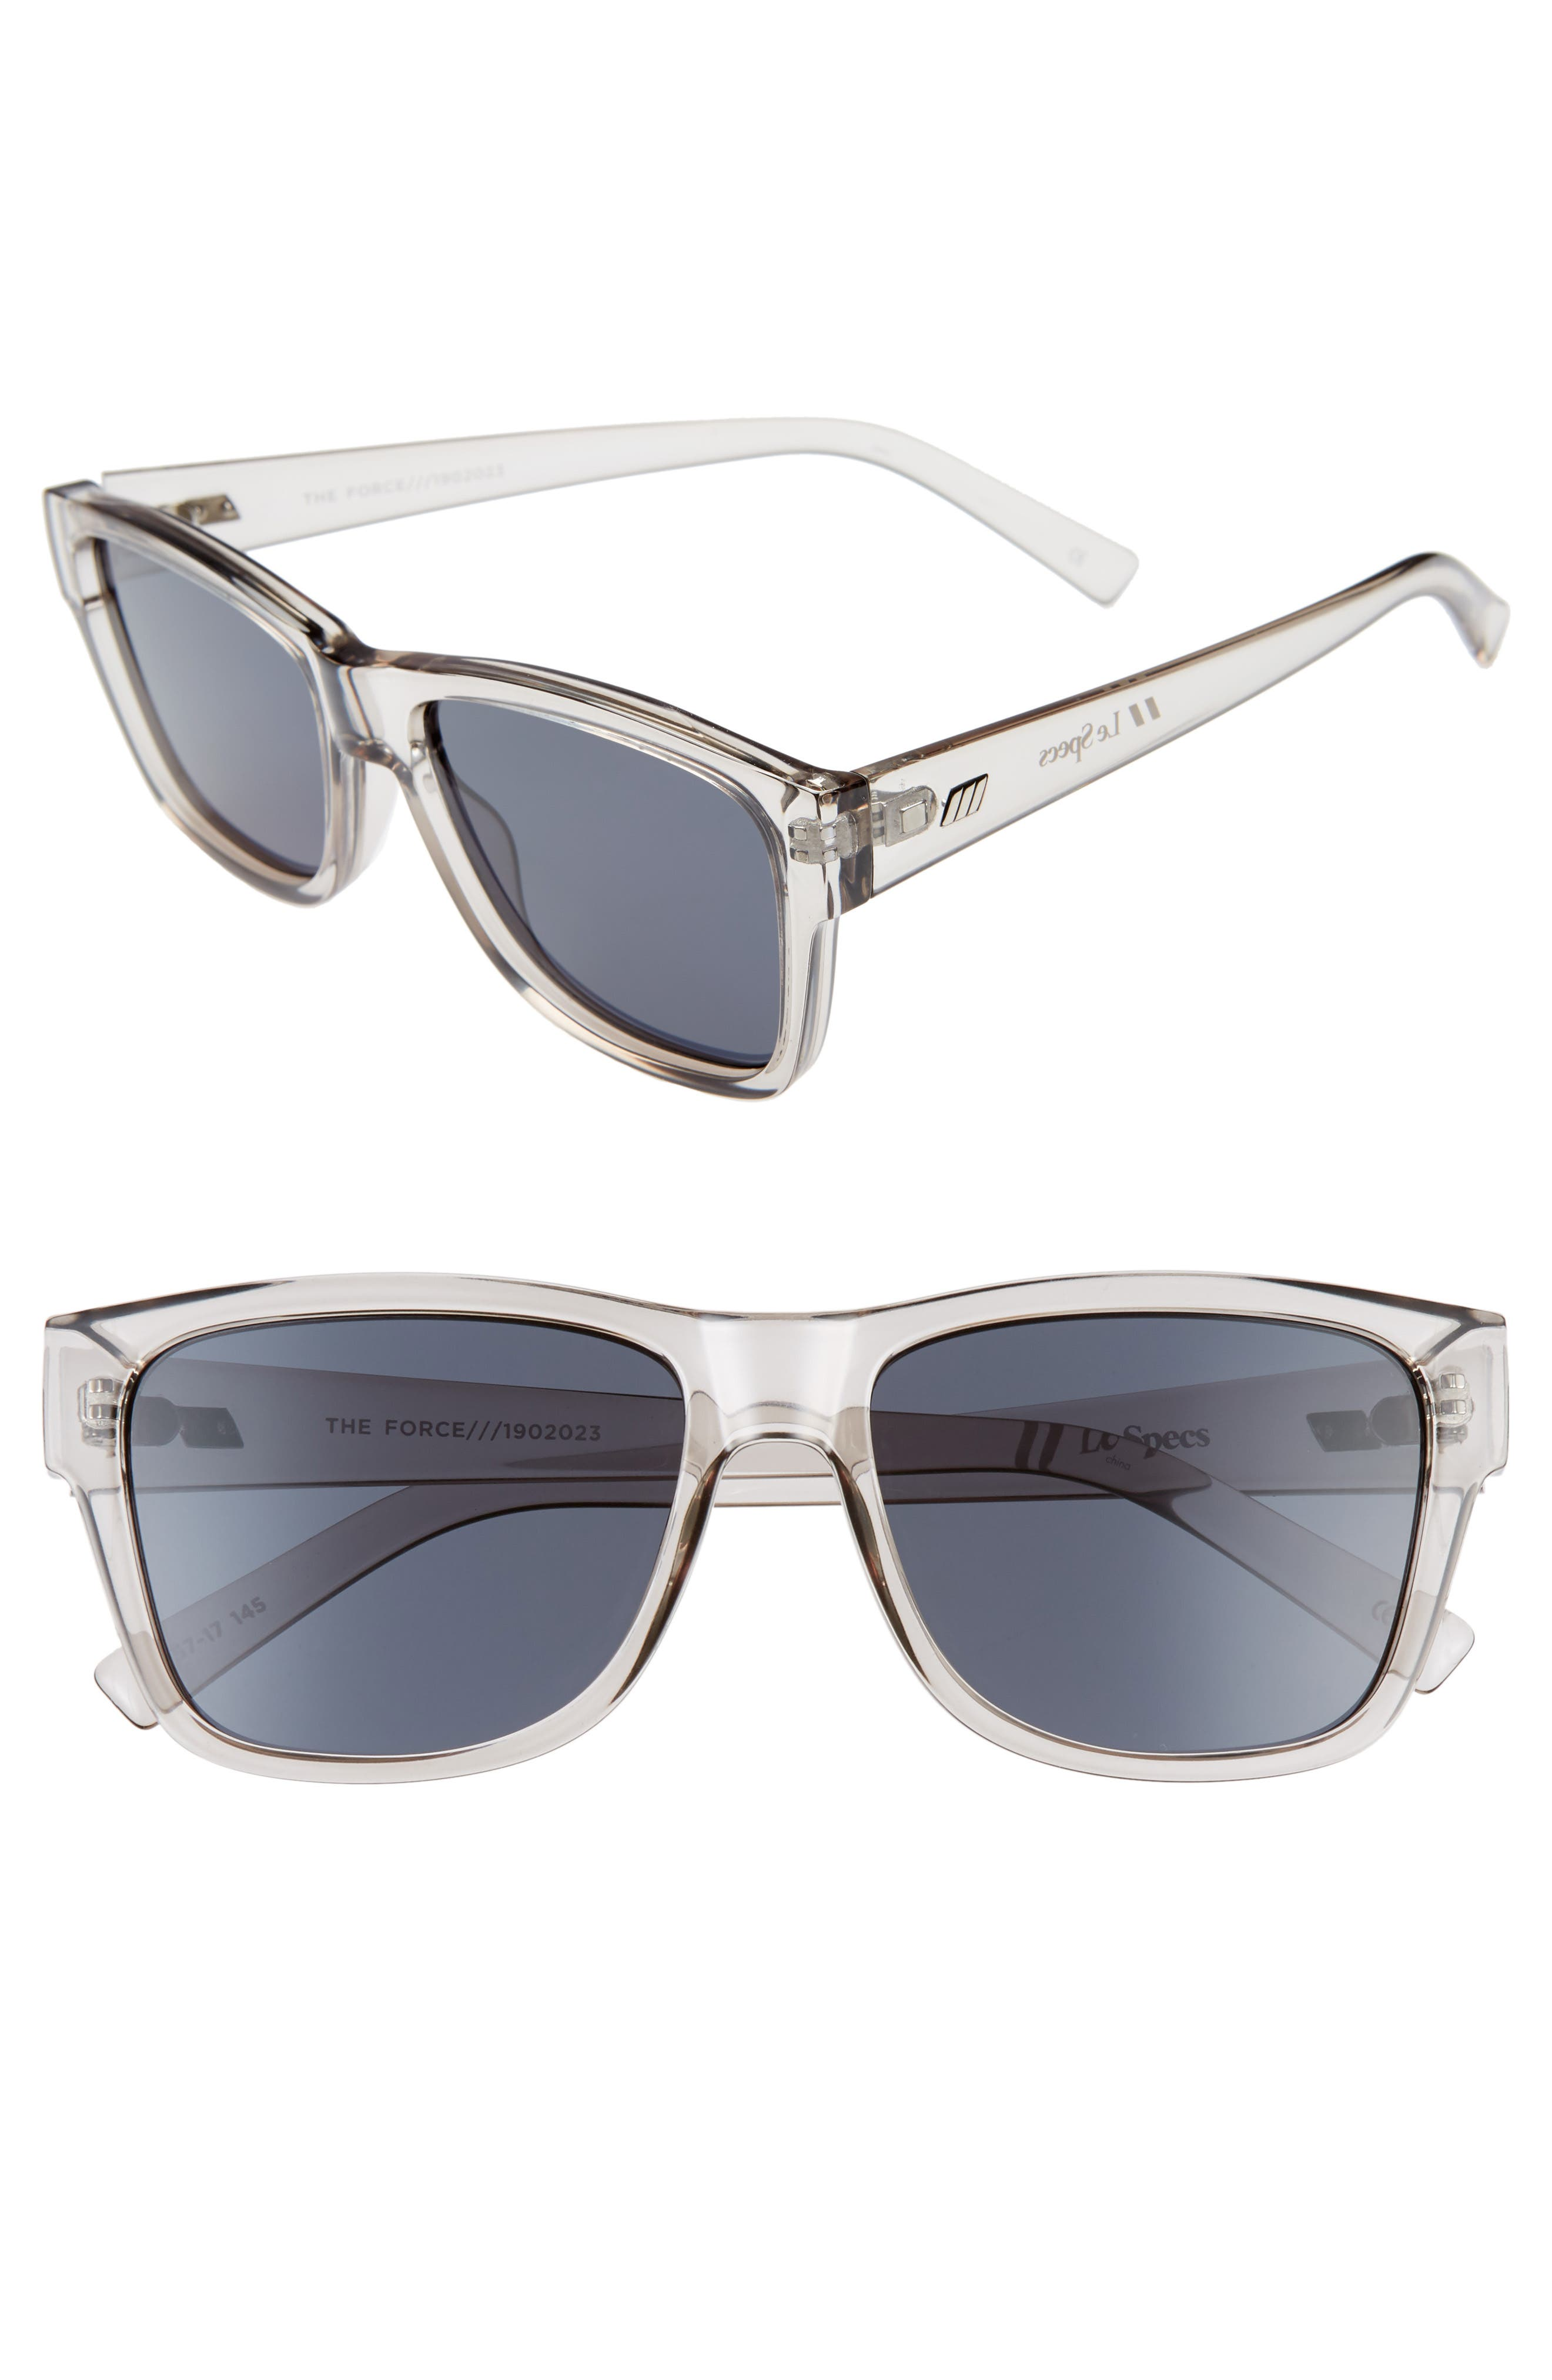 Le Specs The Force 57Mm Transparent Square Sunglasses - Transparent Pewter/ Smoke